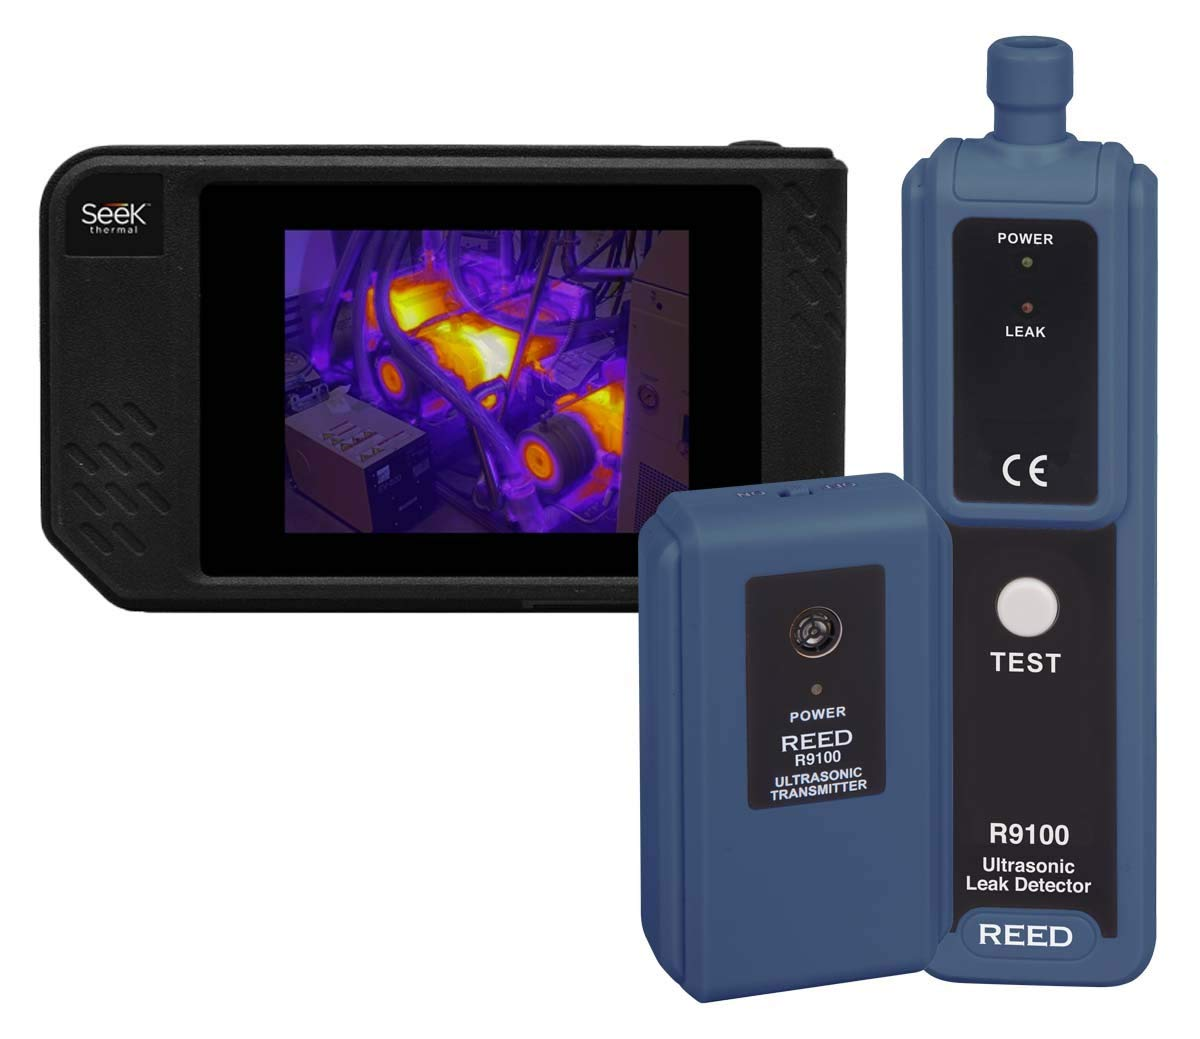 Seek SQ-AAA-KIT2 ShotPRO Pocket-Sized Handheld